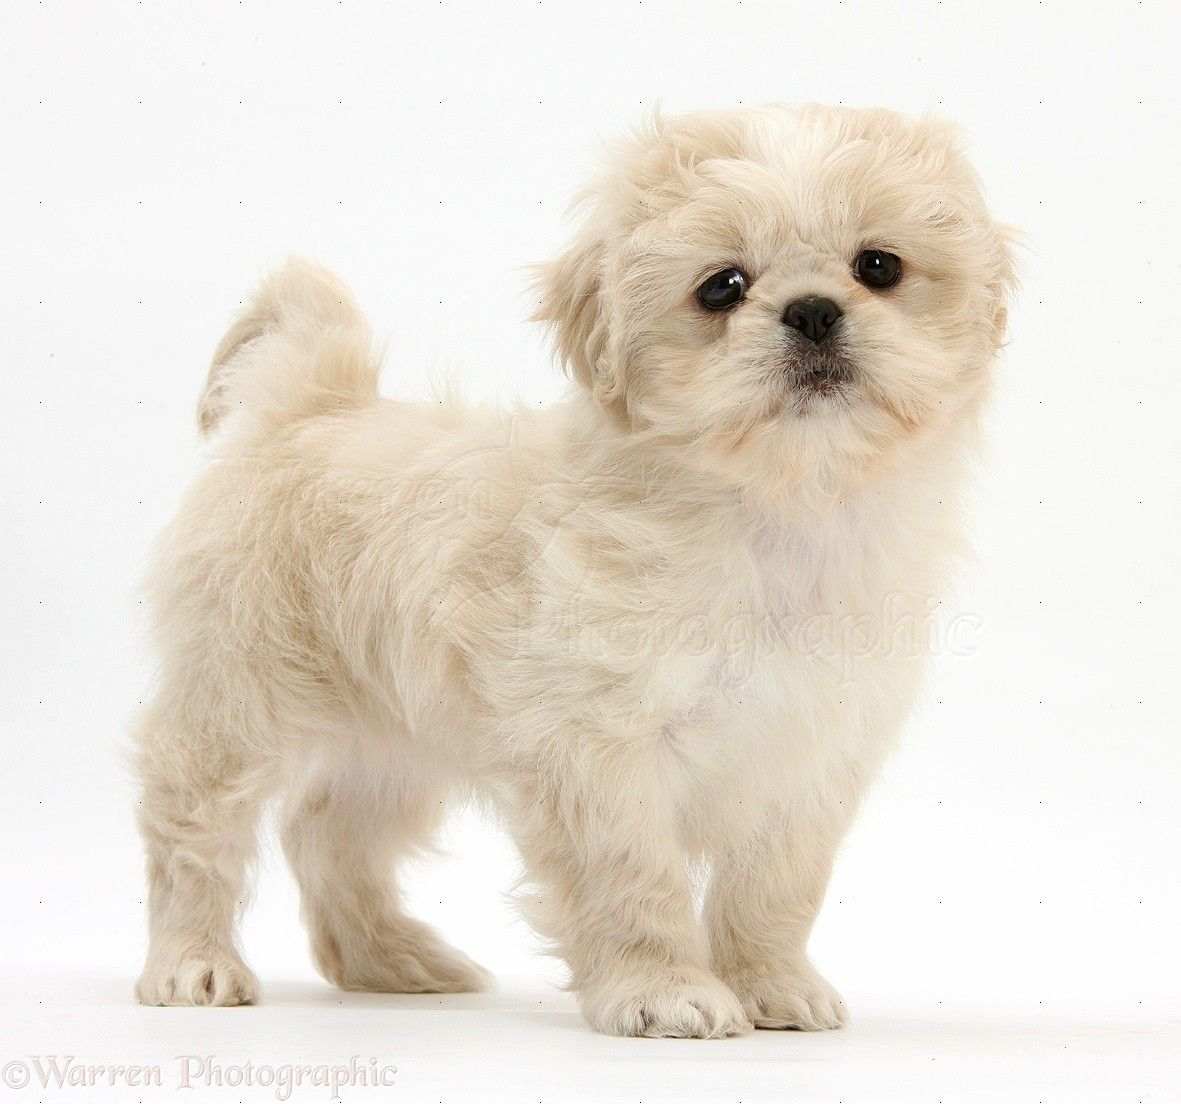 Dog Cream Shih Tzu Pup Photo Shih Tzu Puppies Dogs And Puppies